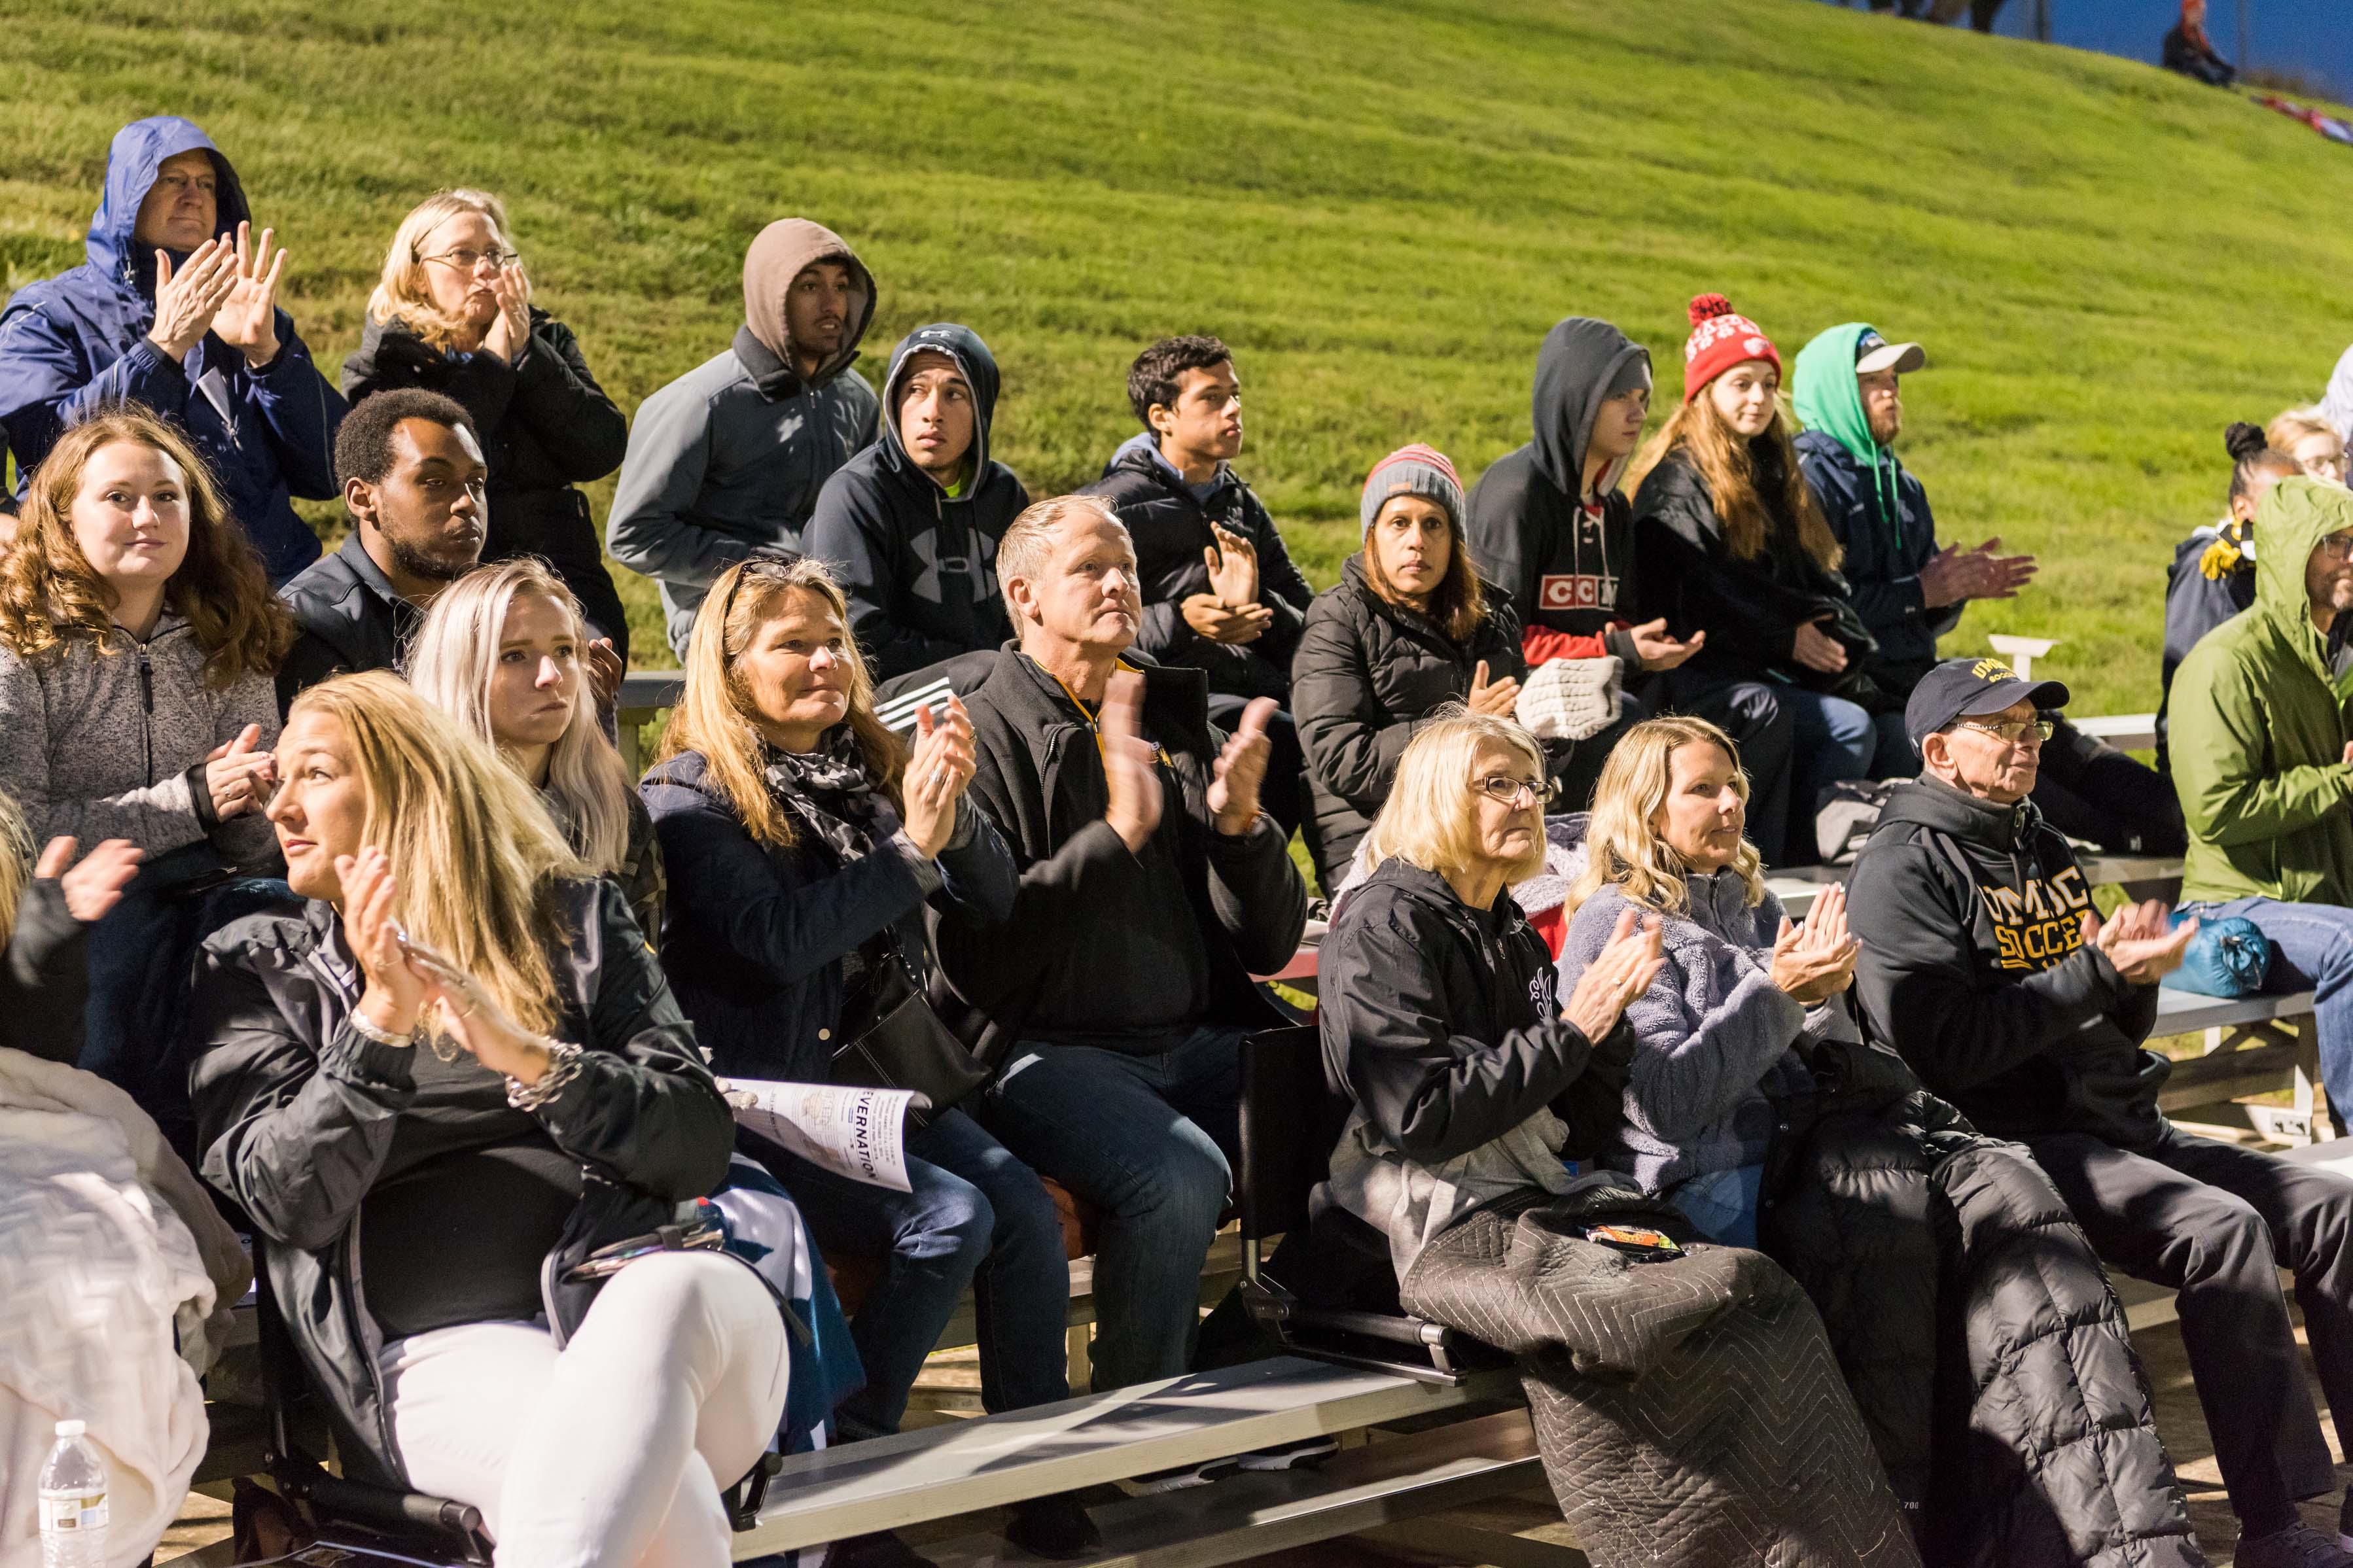 Fans applaud at retriever soccer park